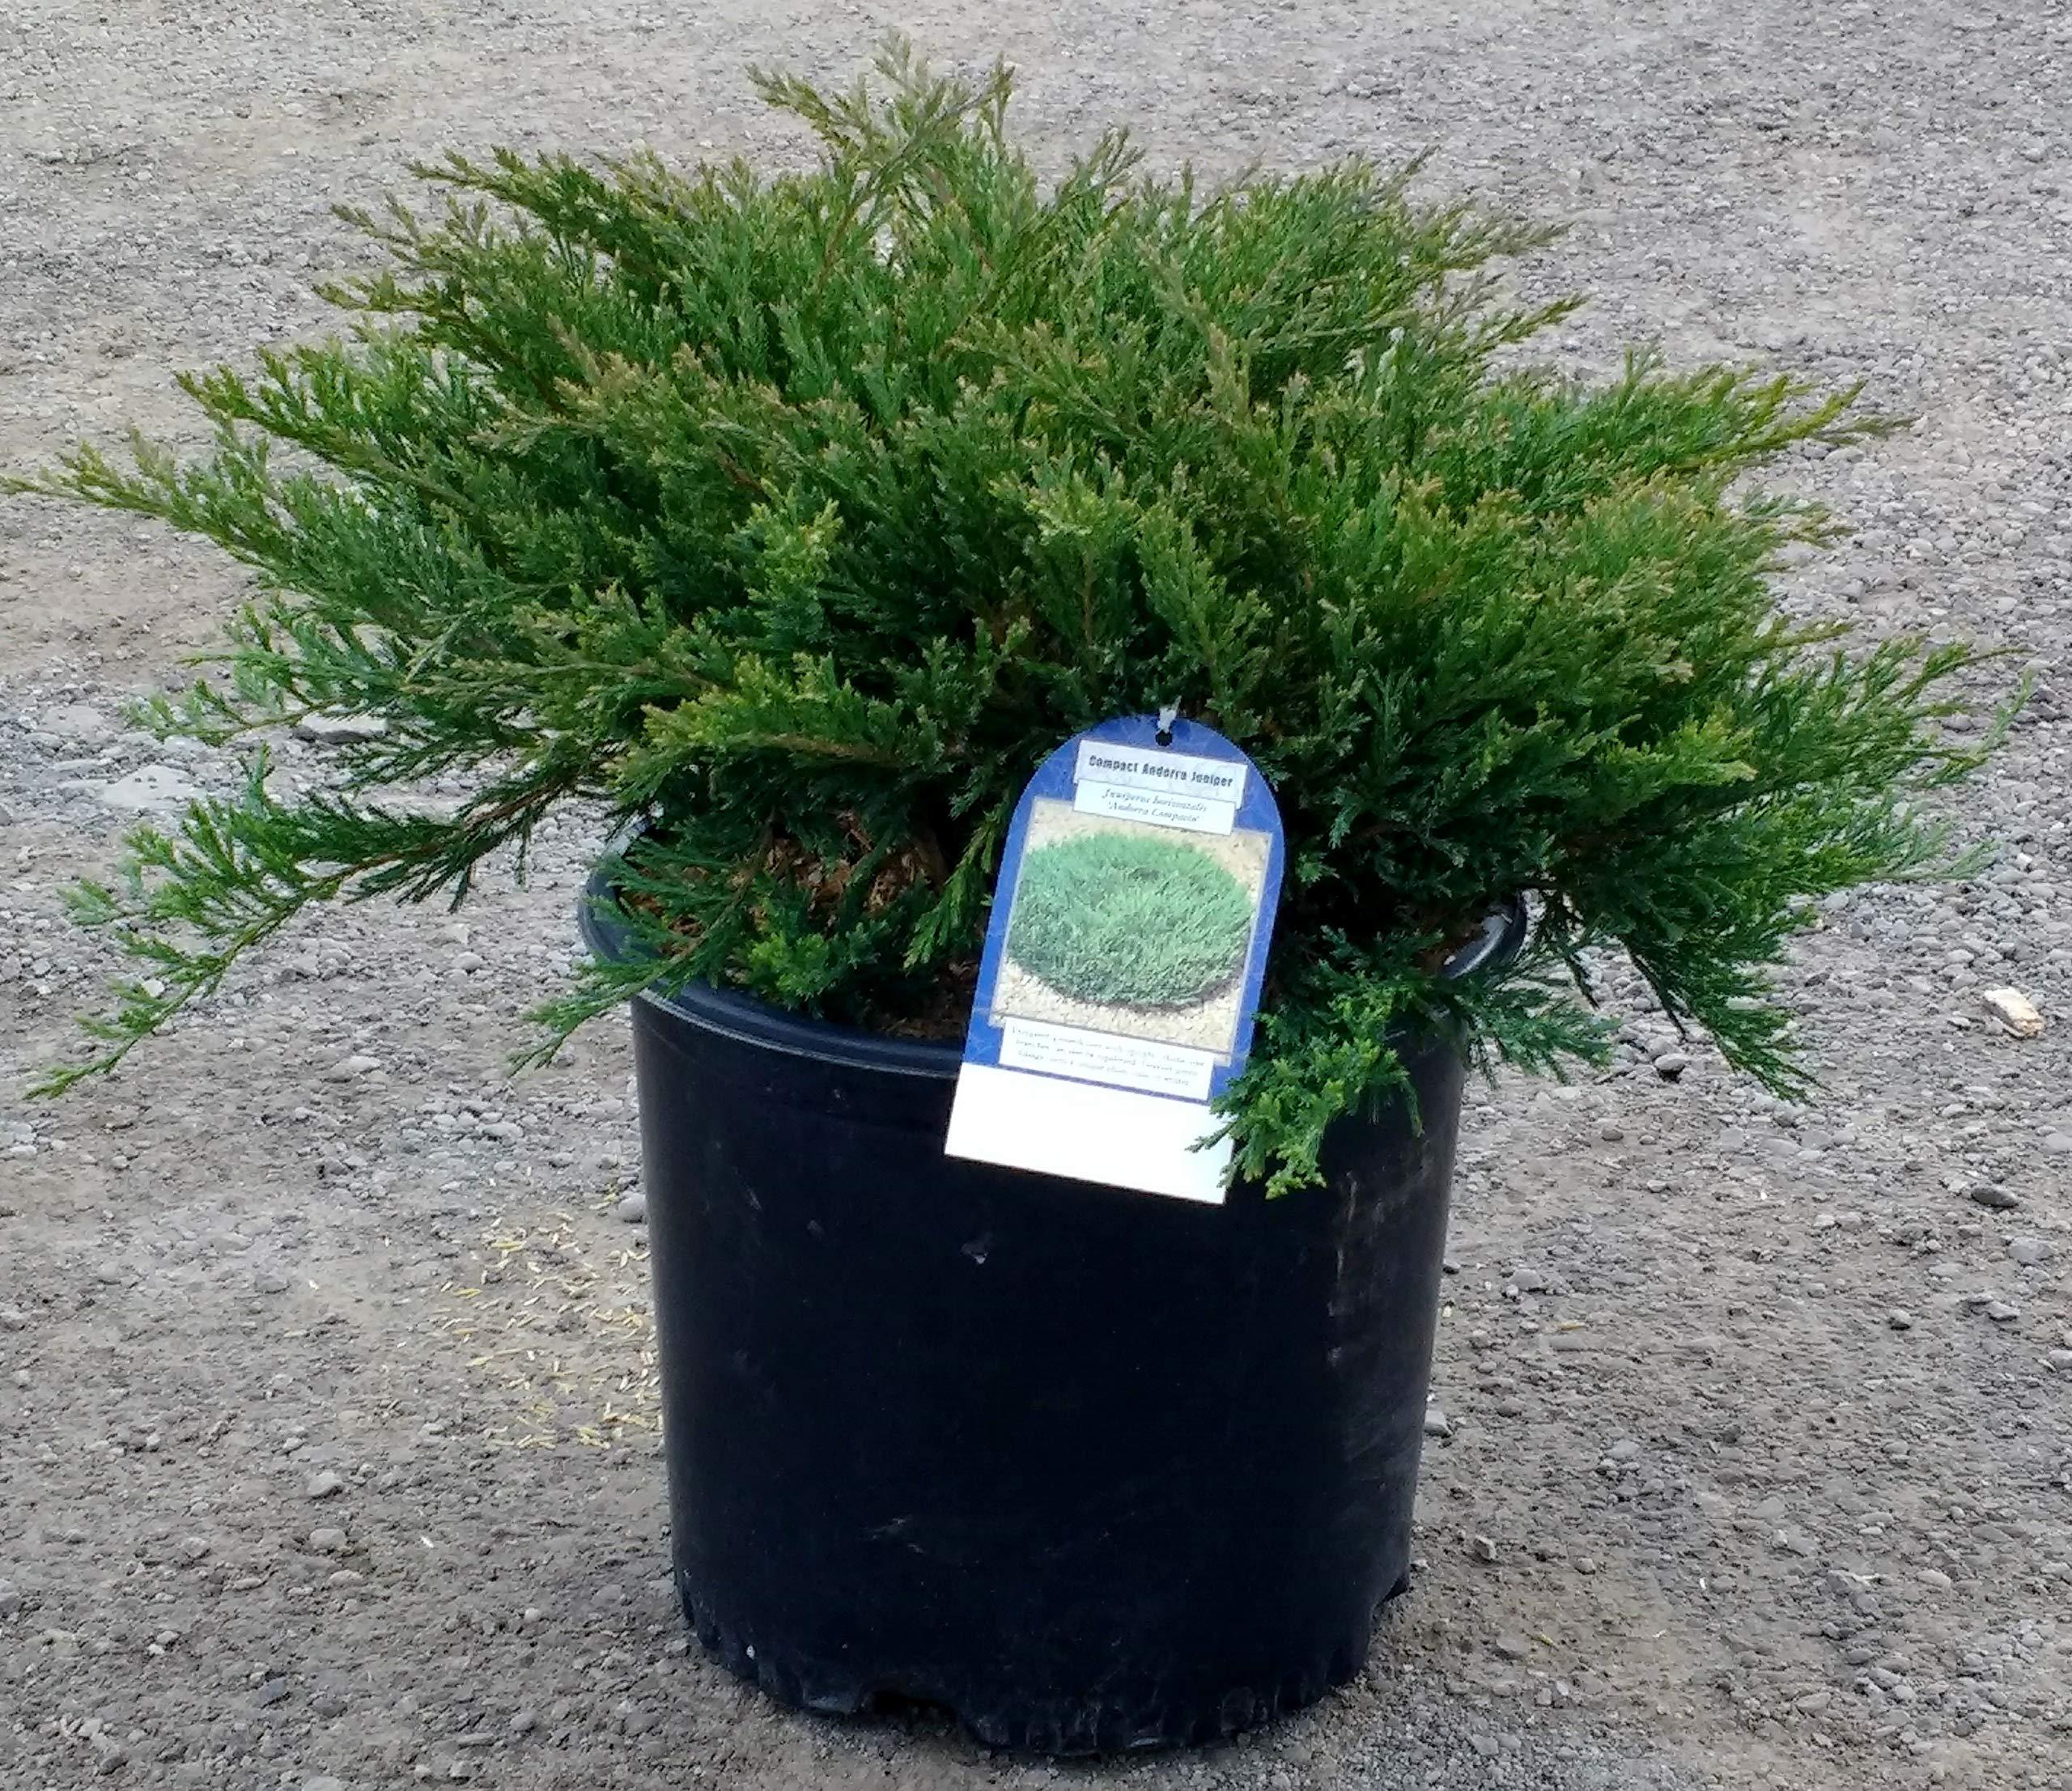 Compact Andorra Juniper - Low-Growing Evergreen Groundcover - 3 Gallon Pot